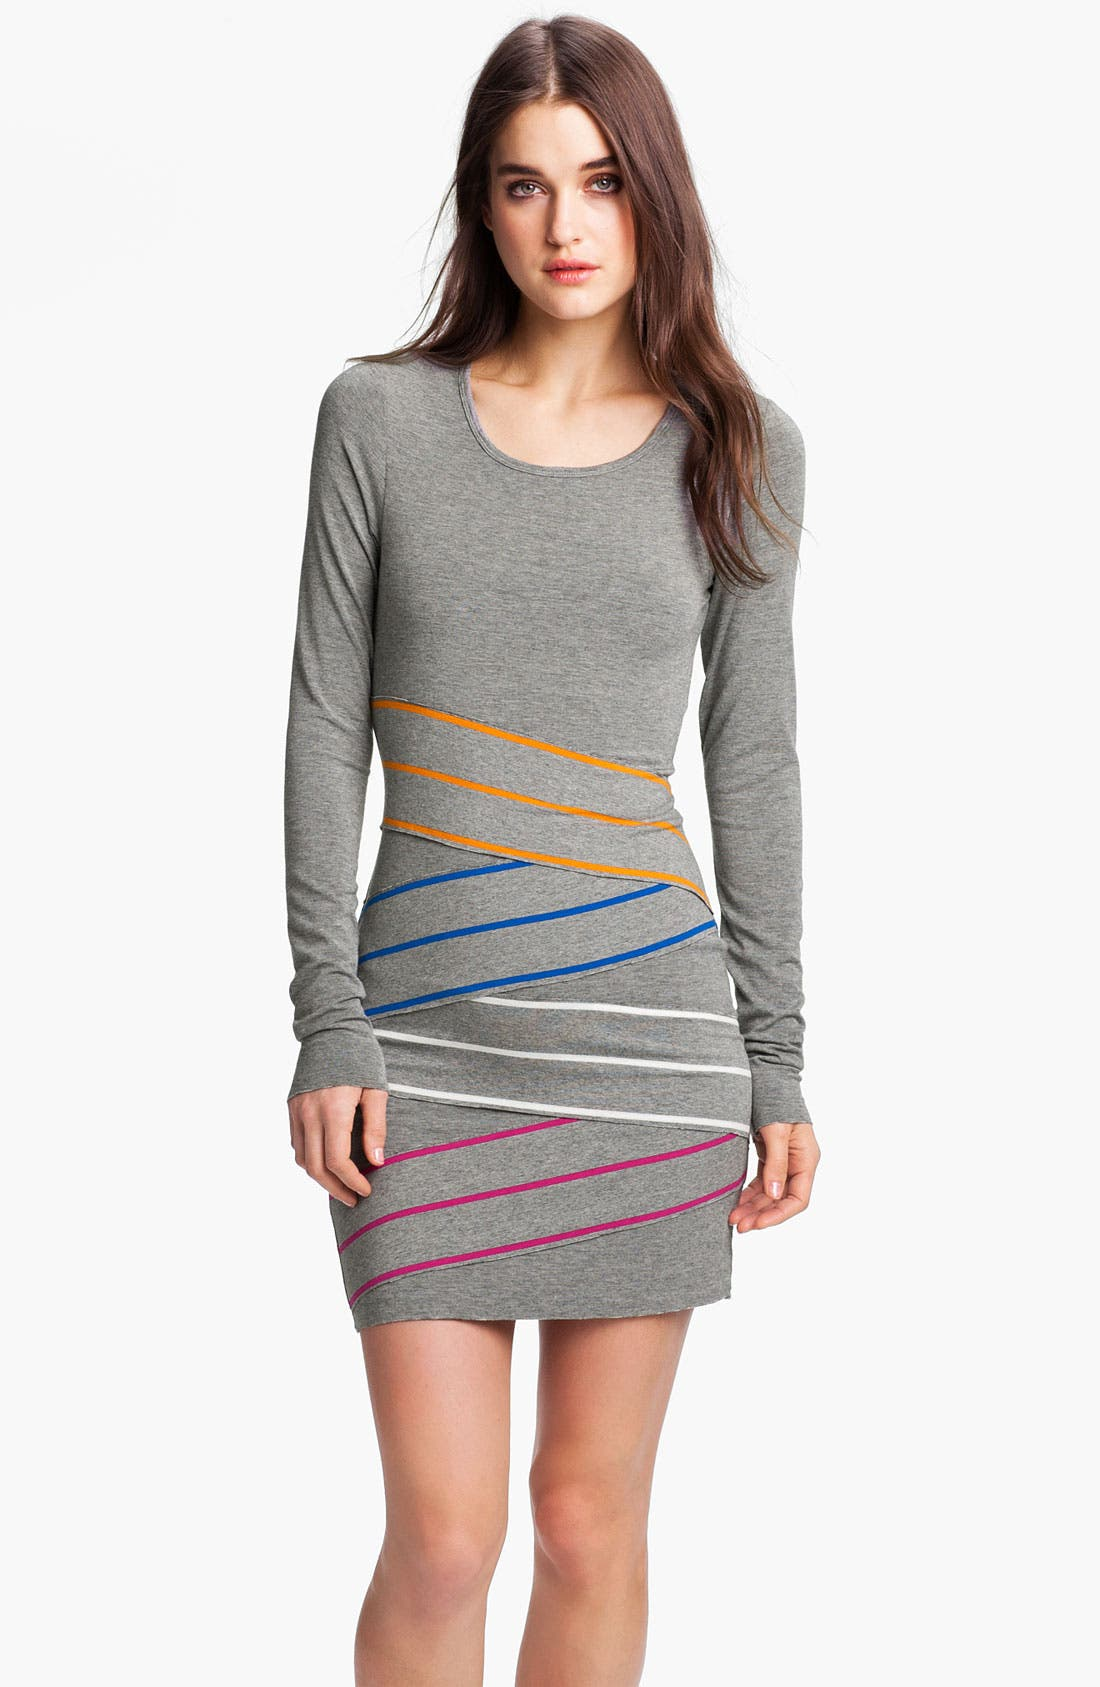 Main Image - B44 Dressed by Bailey 44 'Triathlon' Multi Stripe Jersey Dress